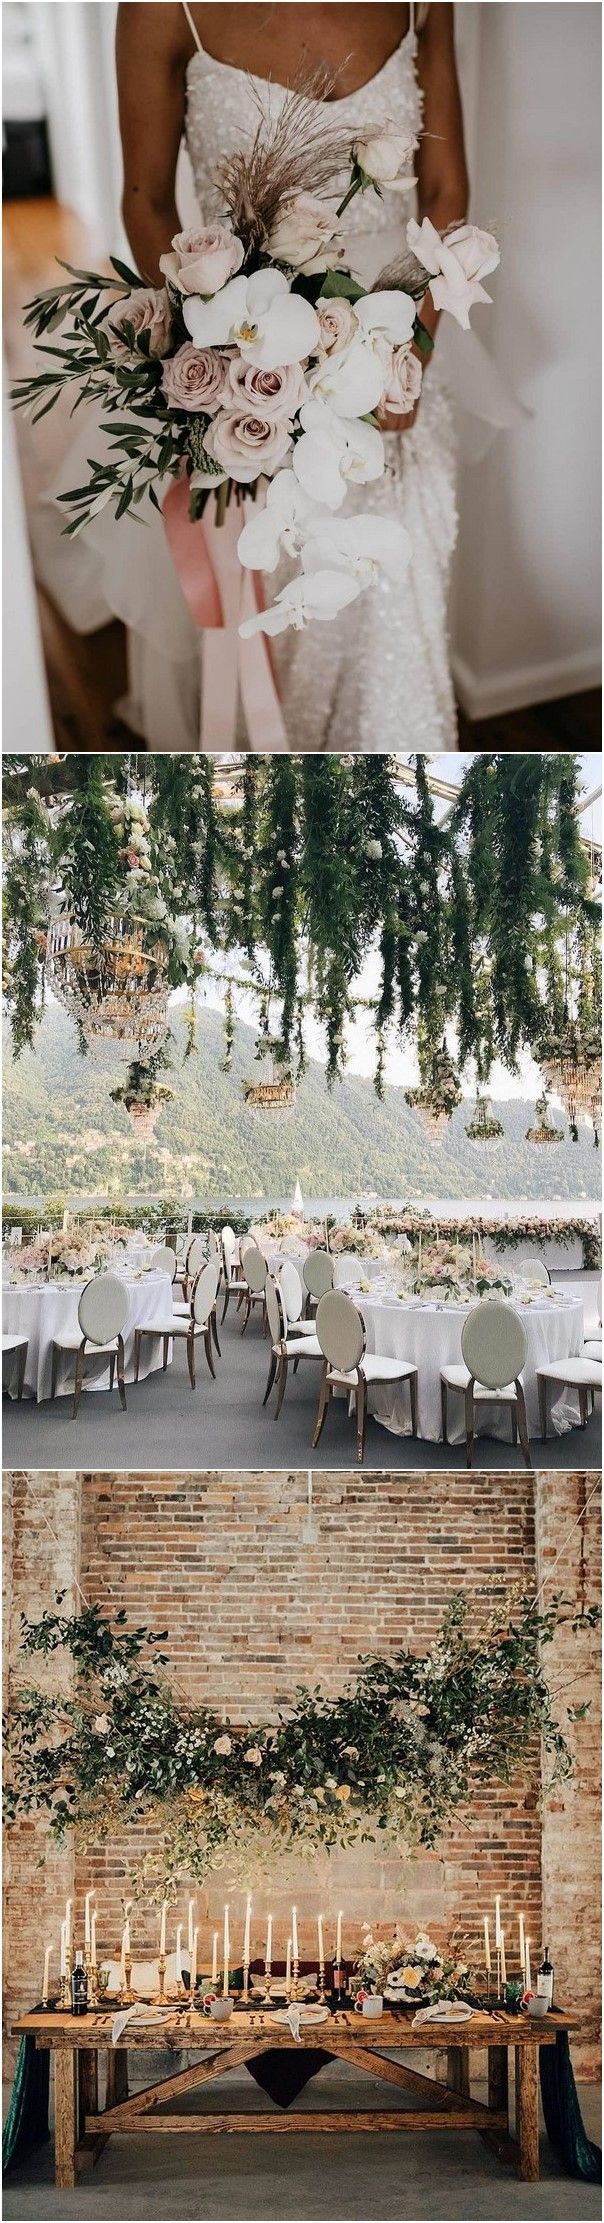 20 trendige rustikale Herbstgrün Hochzeitsideen